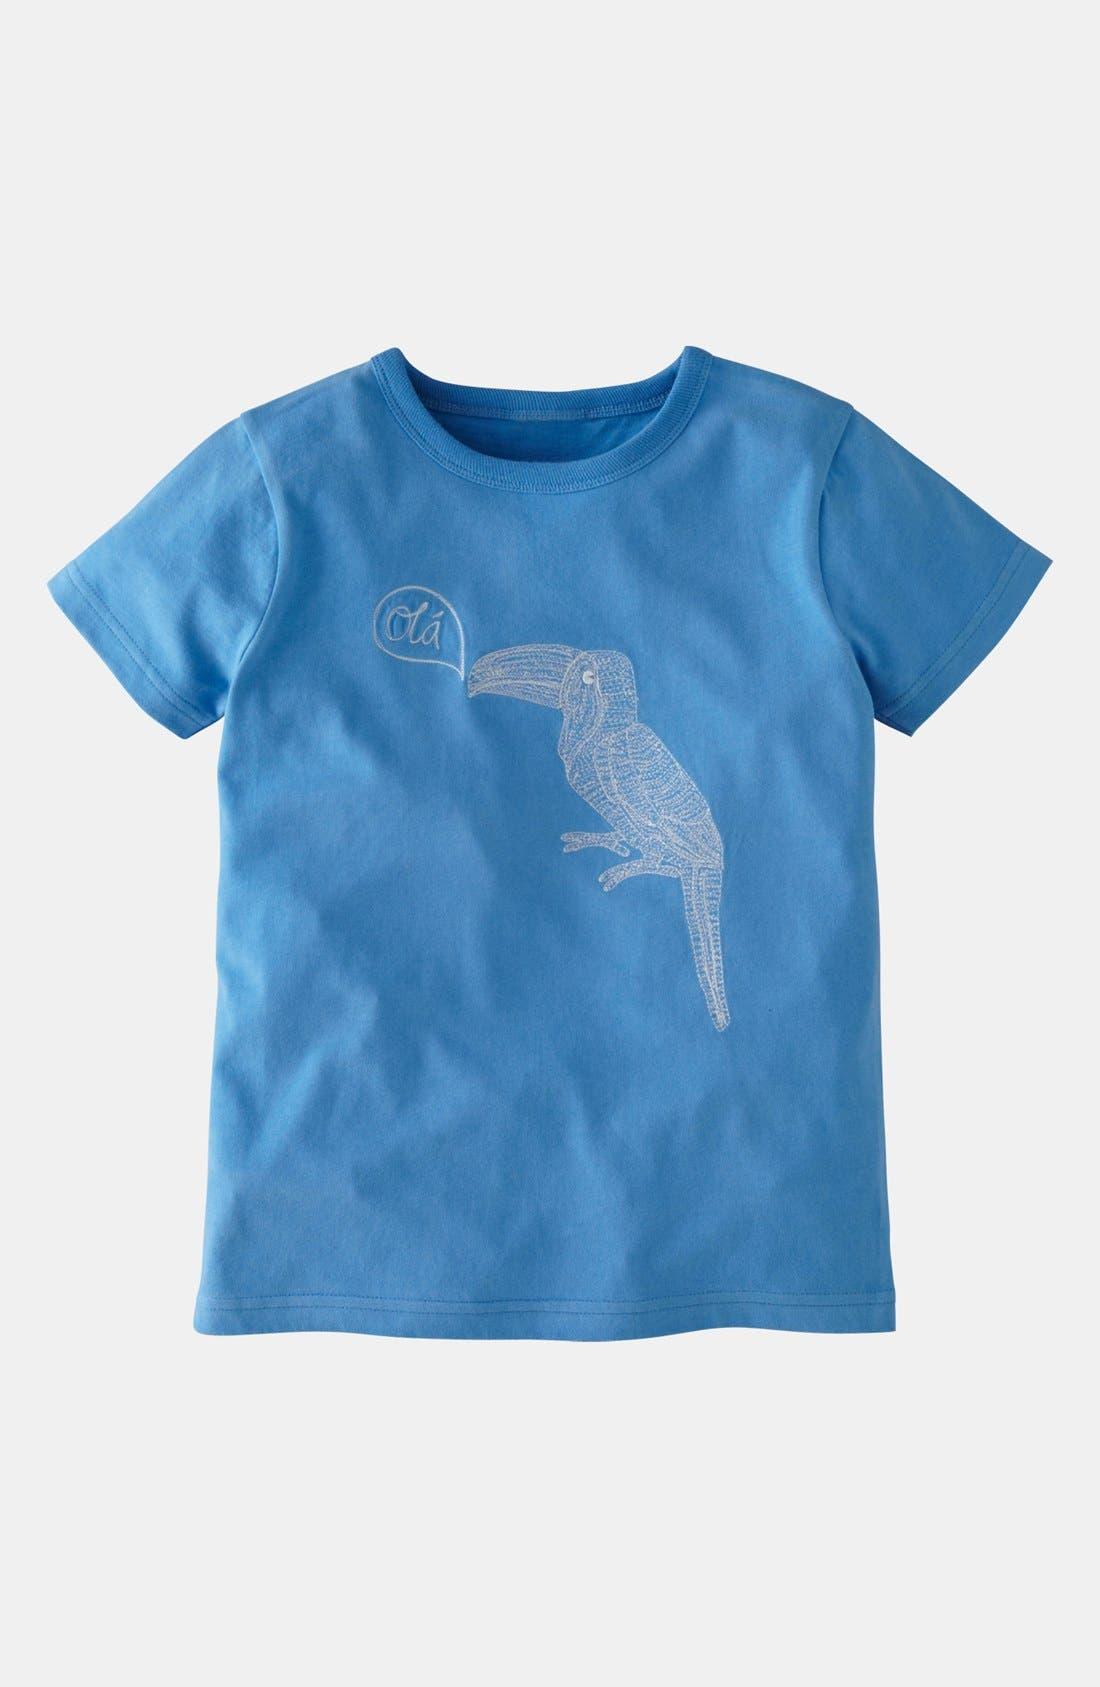 Alternate Image 1 Selected - Mini Boden 'Superstitch' T-Shirt (Toddler Boys)